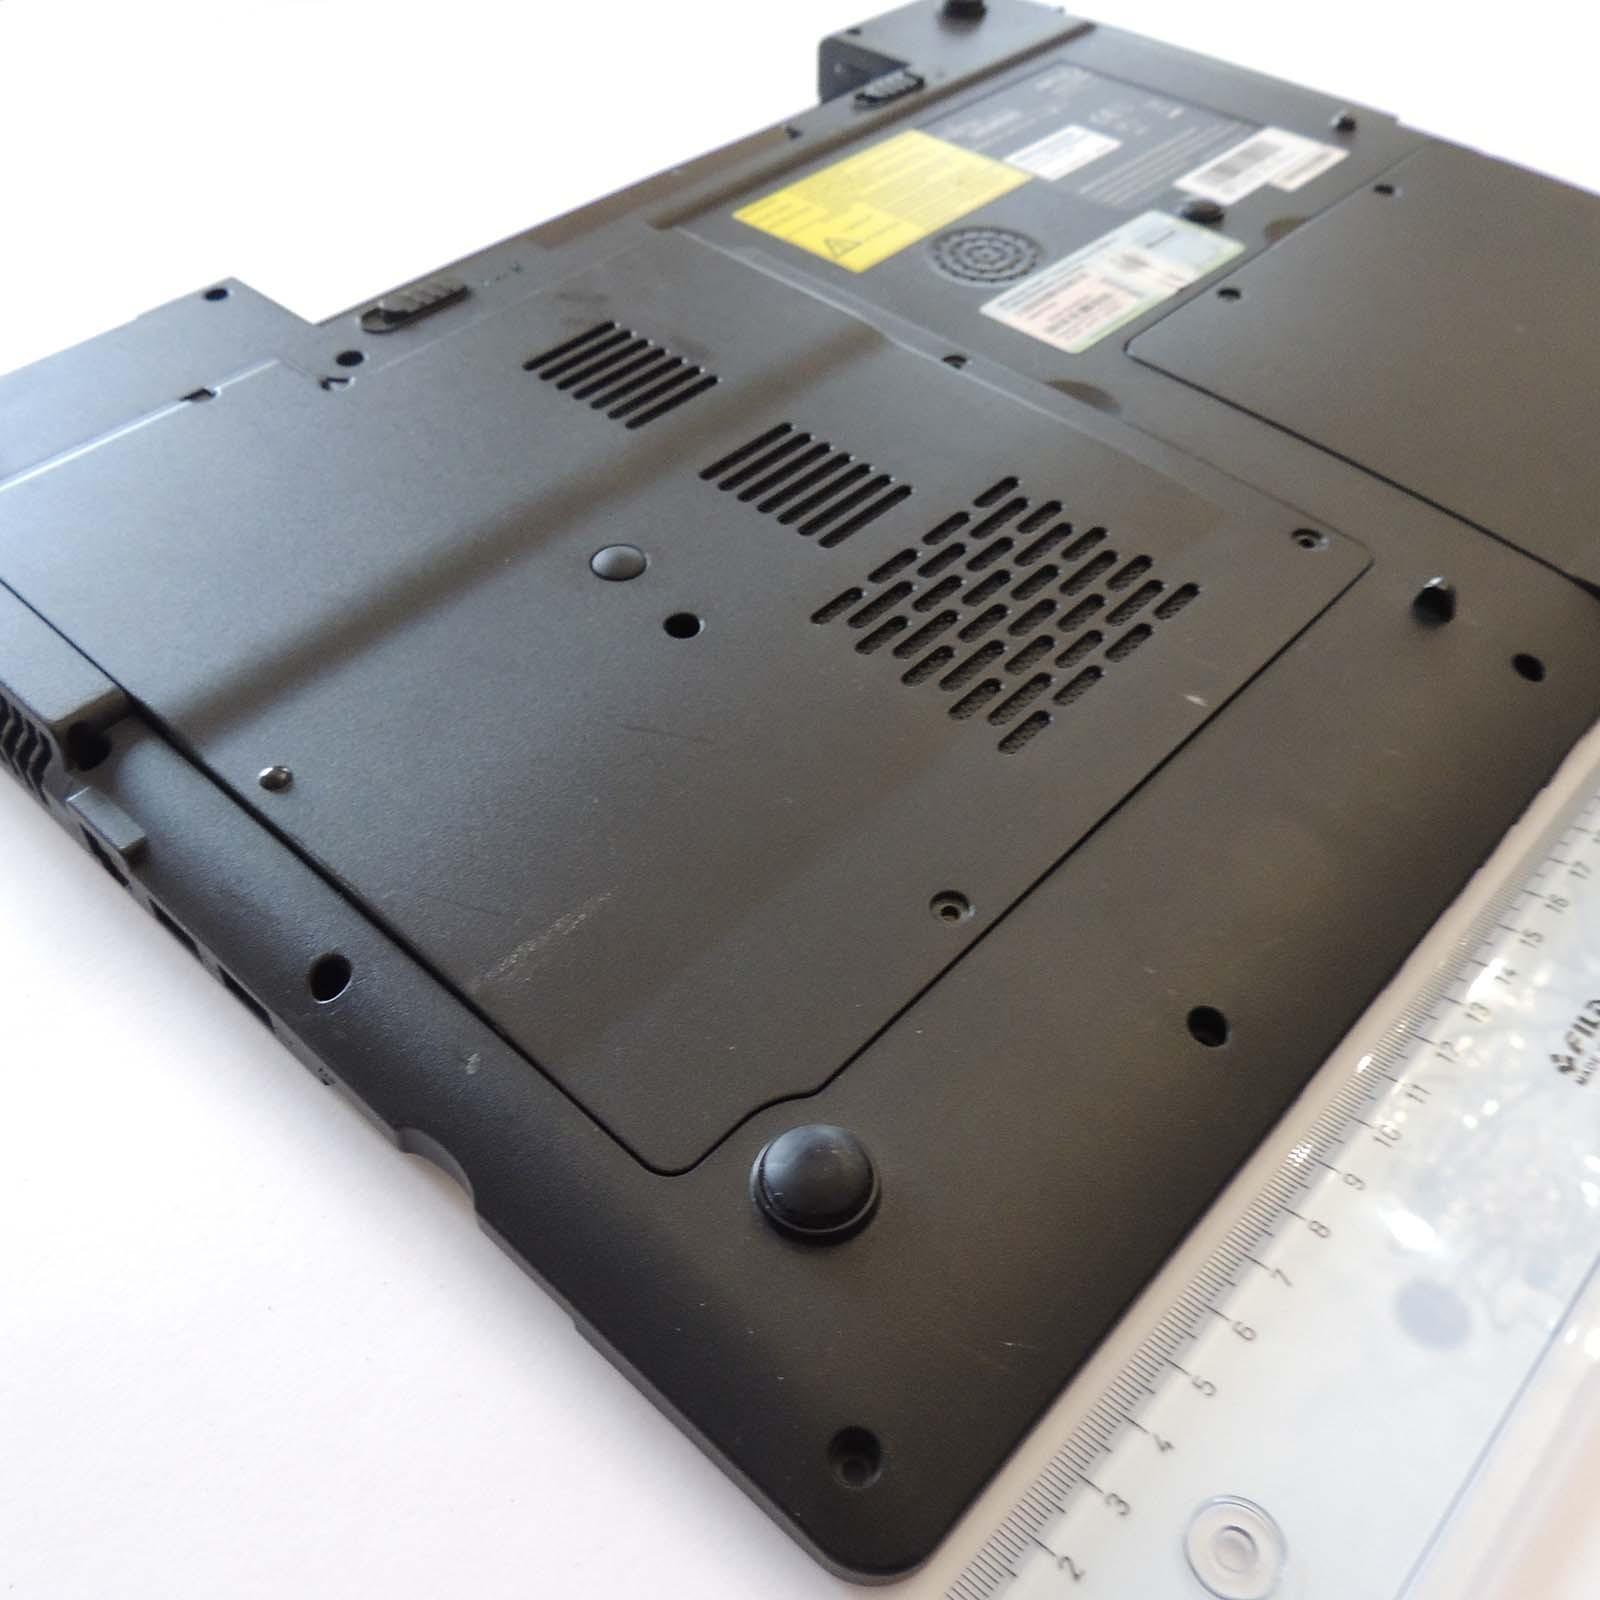 Scocca fujitsu siemens Amilo XA2558 sportellino HD e RAM 24-46823-00